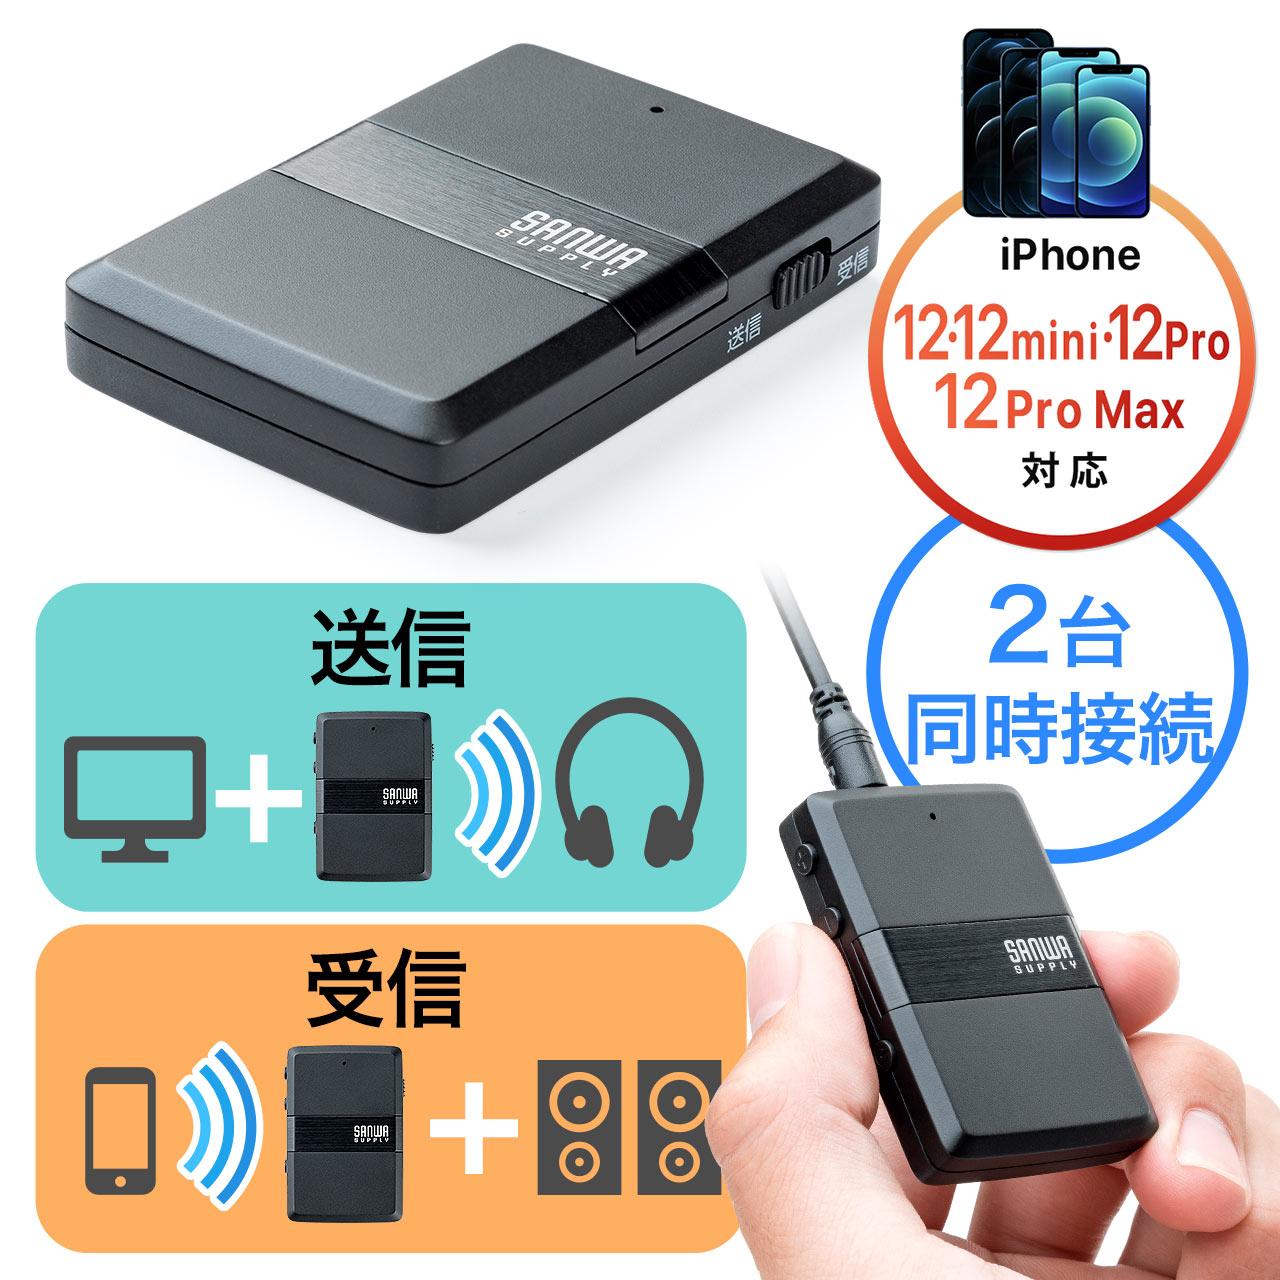 Bluetoothオーディオレシーバー&トランスミッター(2台同時接続・apt-X Low Latency対応・低遅延) サンワダイレクト サンワサプライ ..